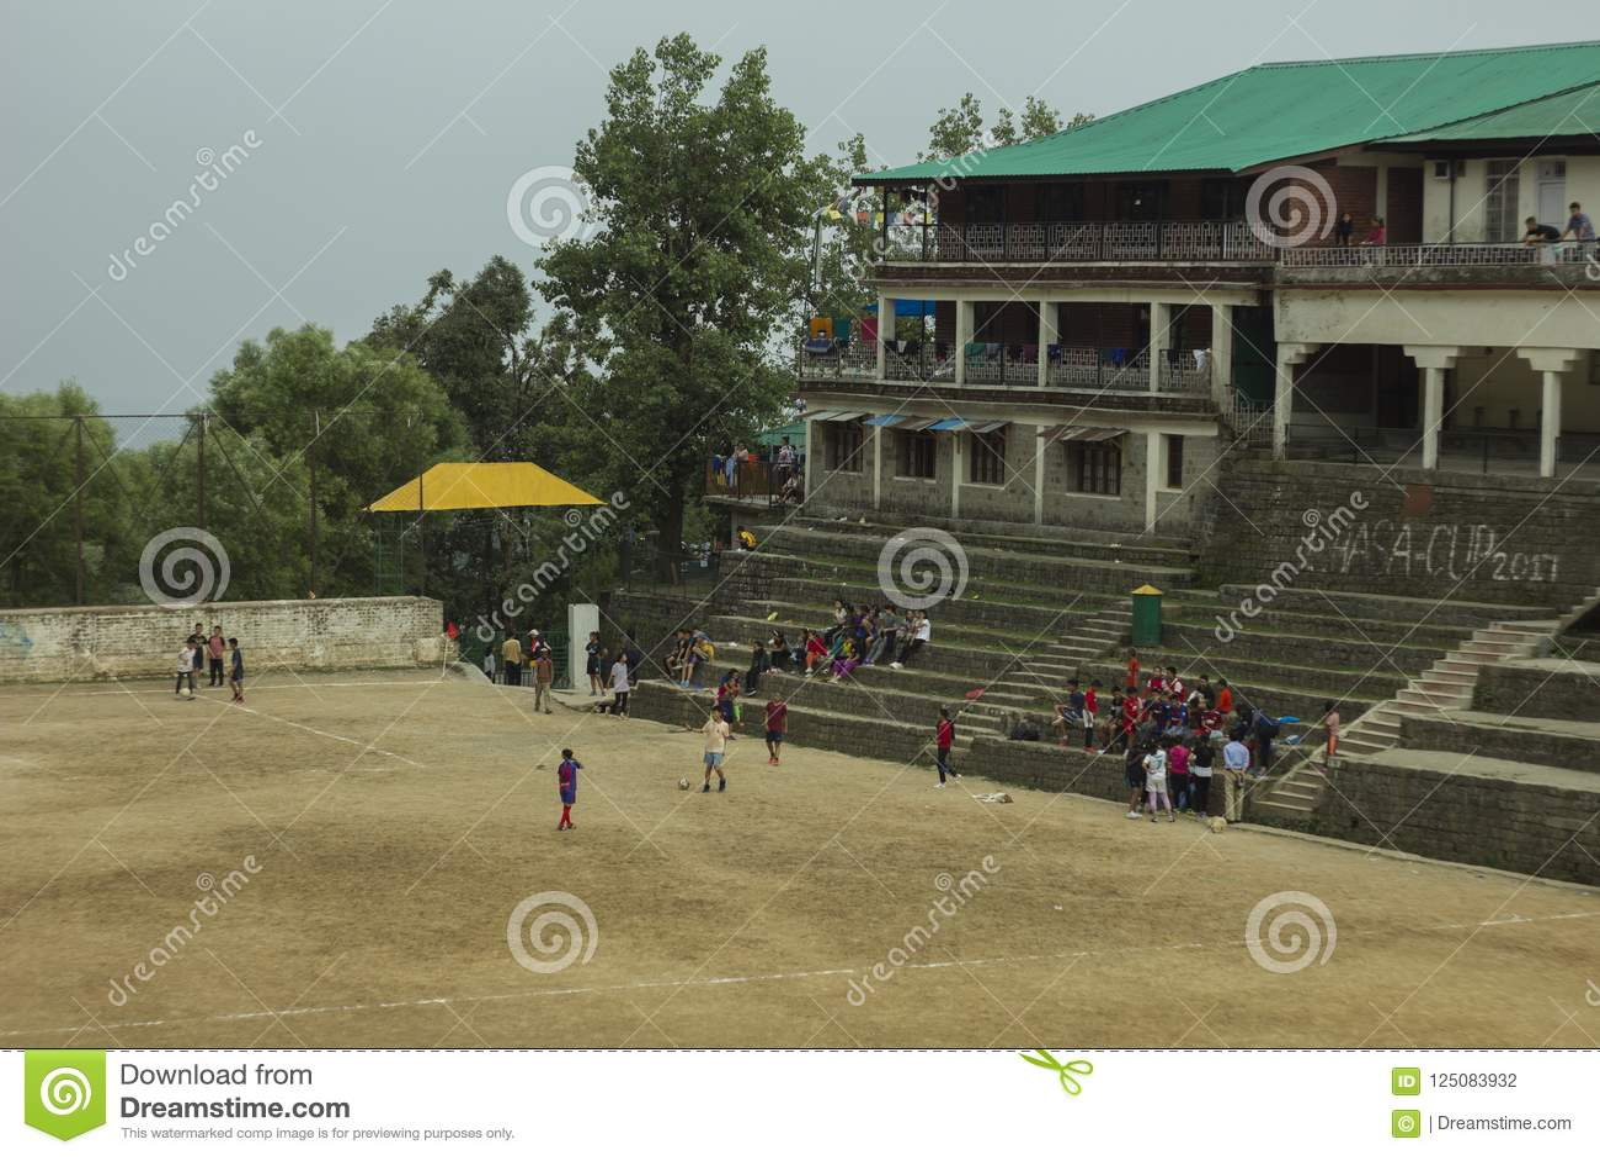 Children play on stadium for sports